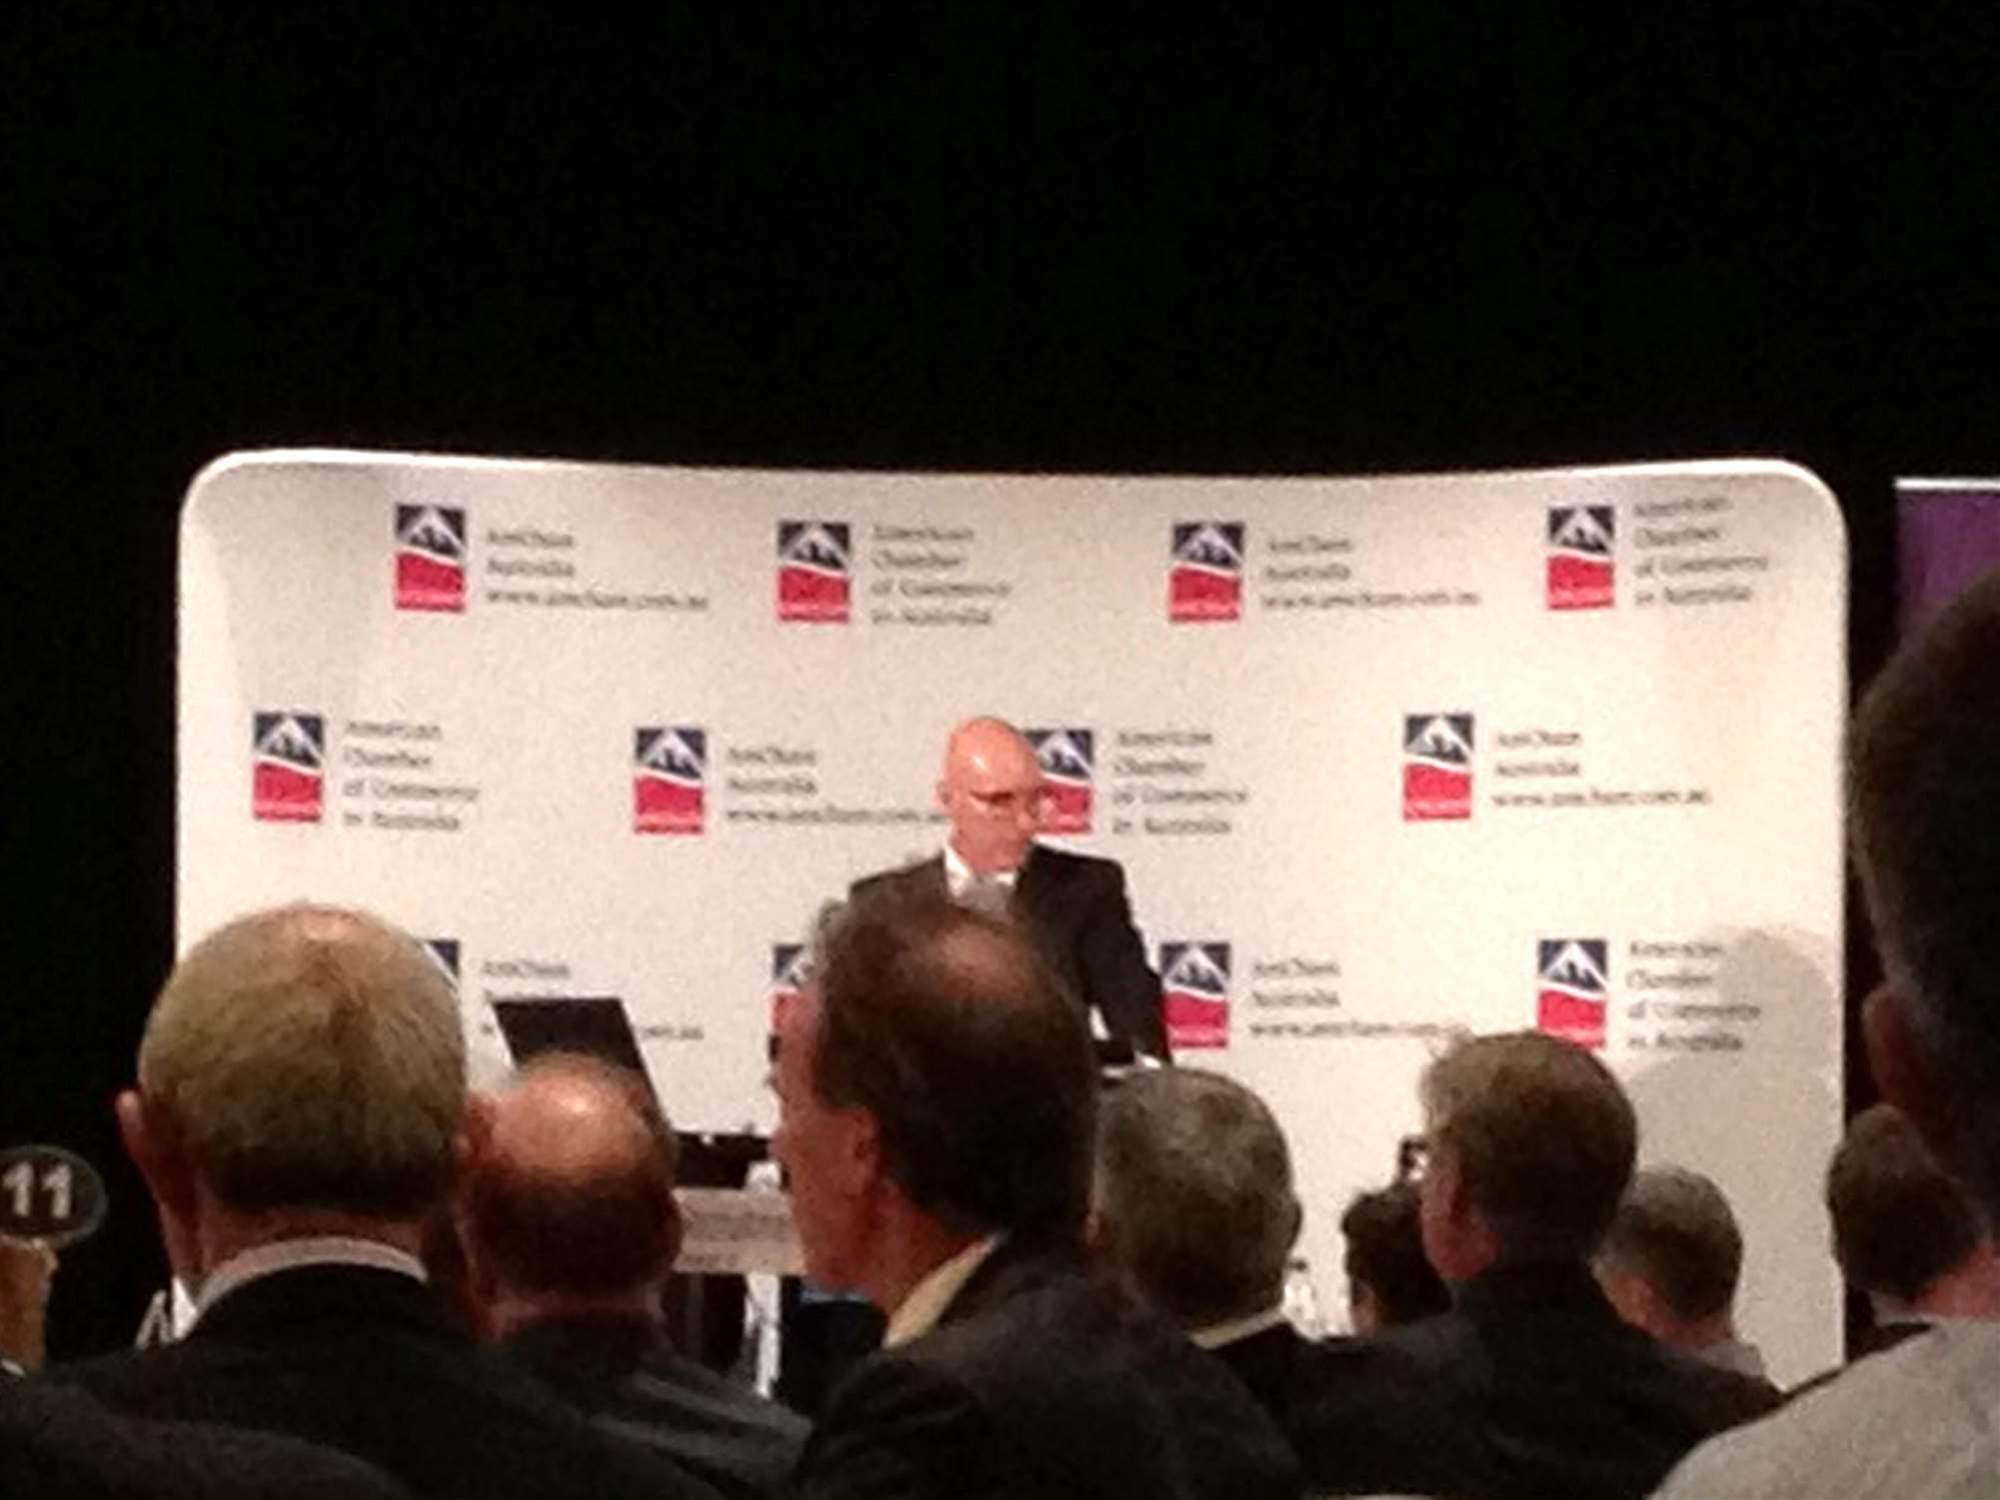 Quigley calls for industry to inform NBN debate